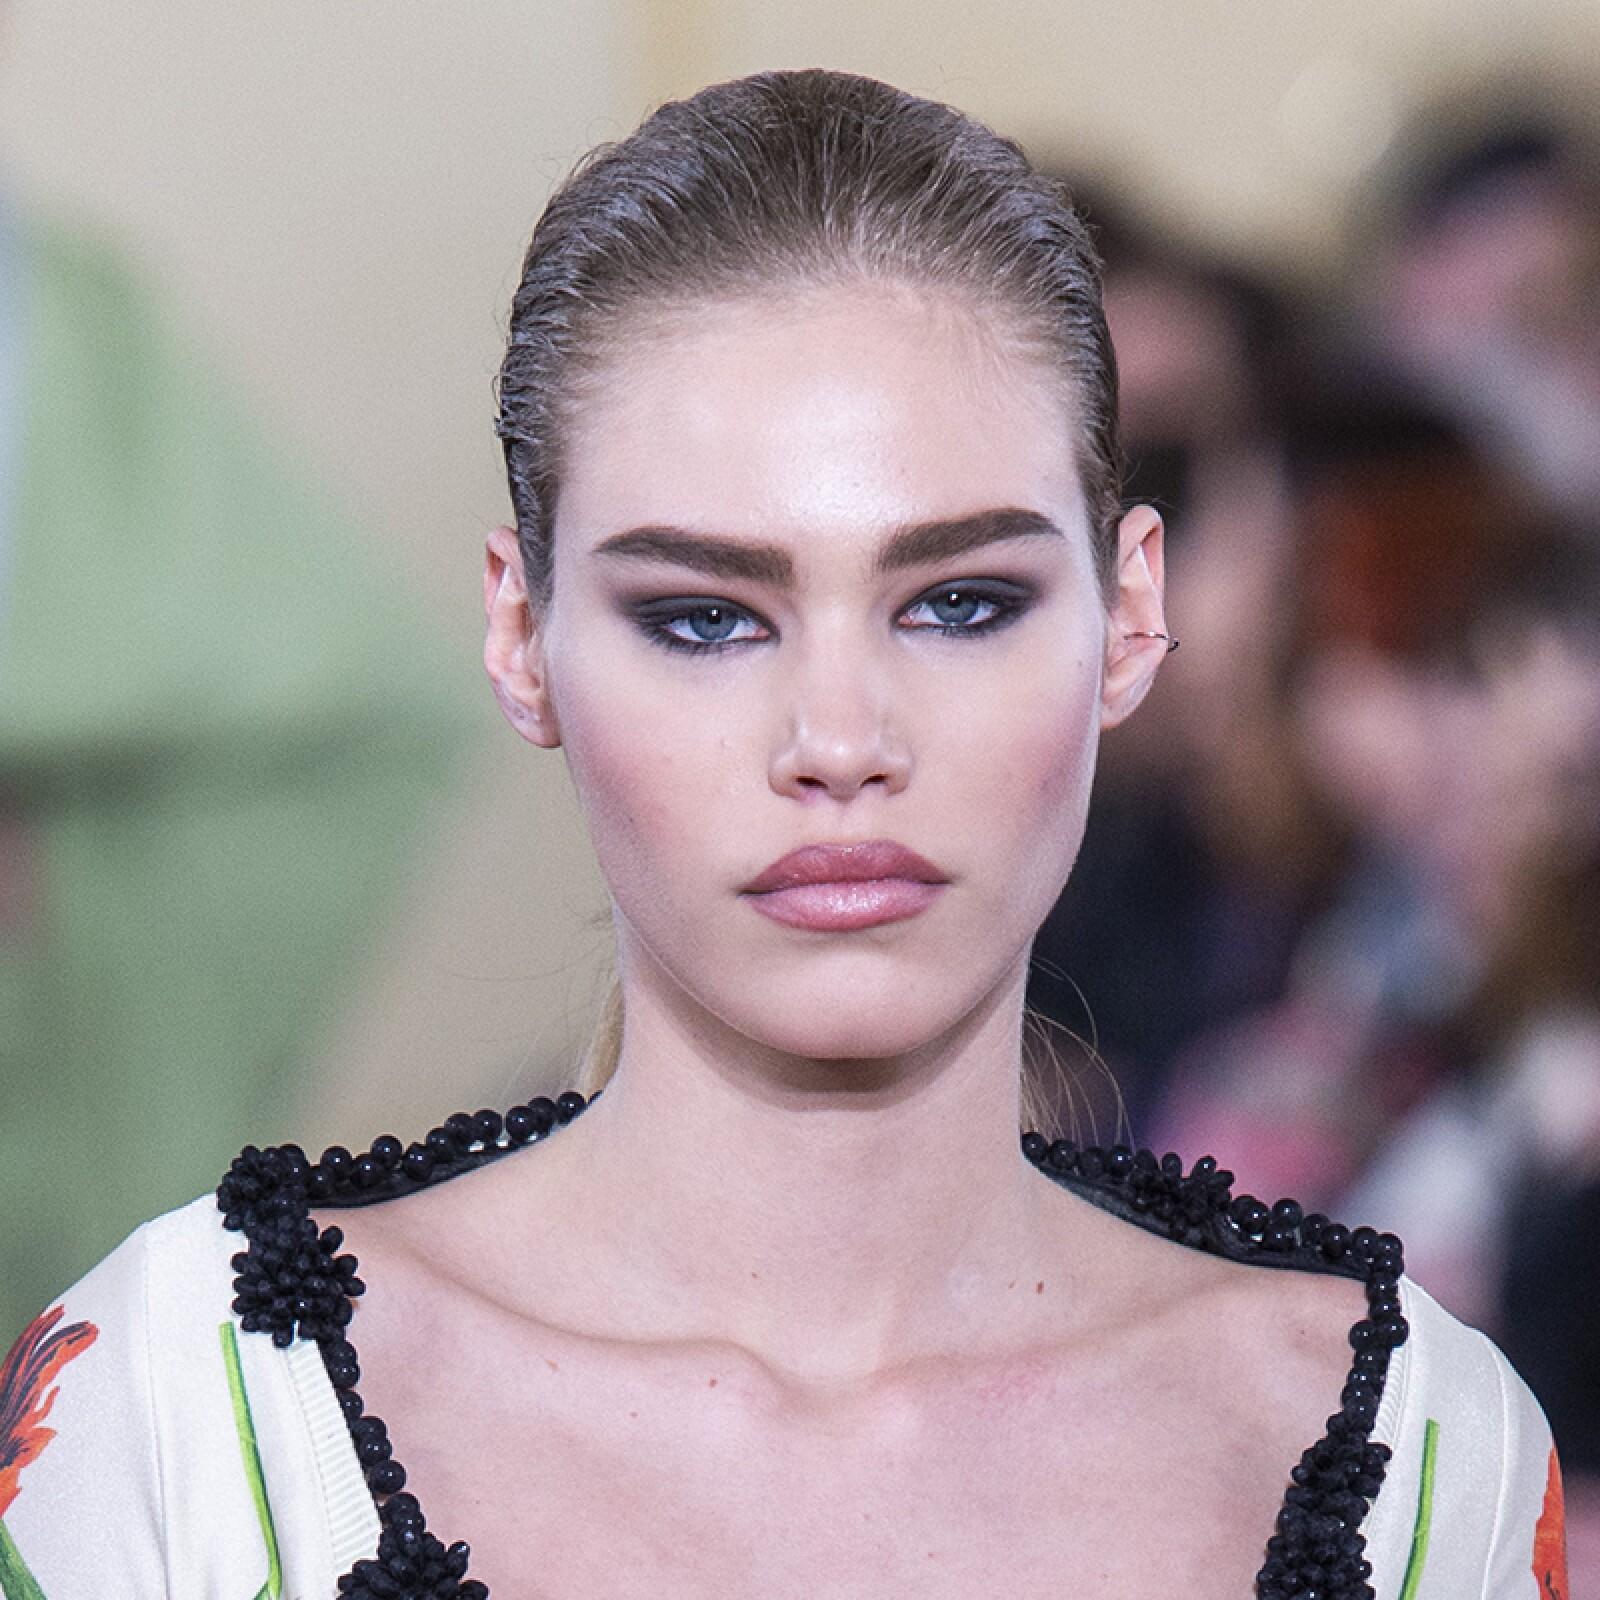 PFW-Paris-Fashion-Week-Runway-Pasarela-Beauty-Look-Belleza-Y-Project